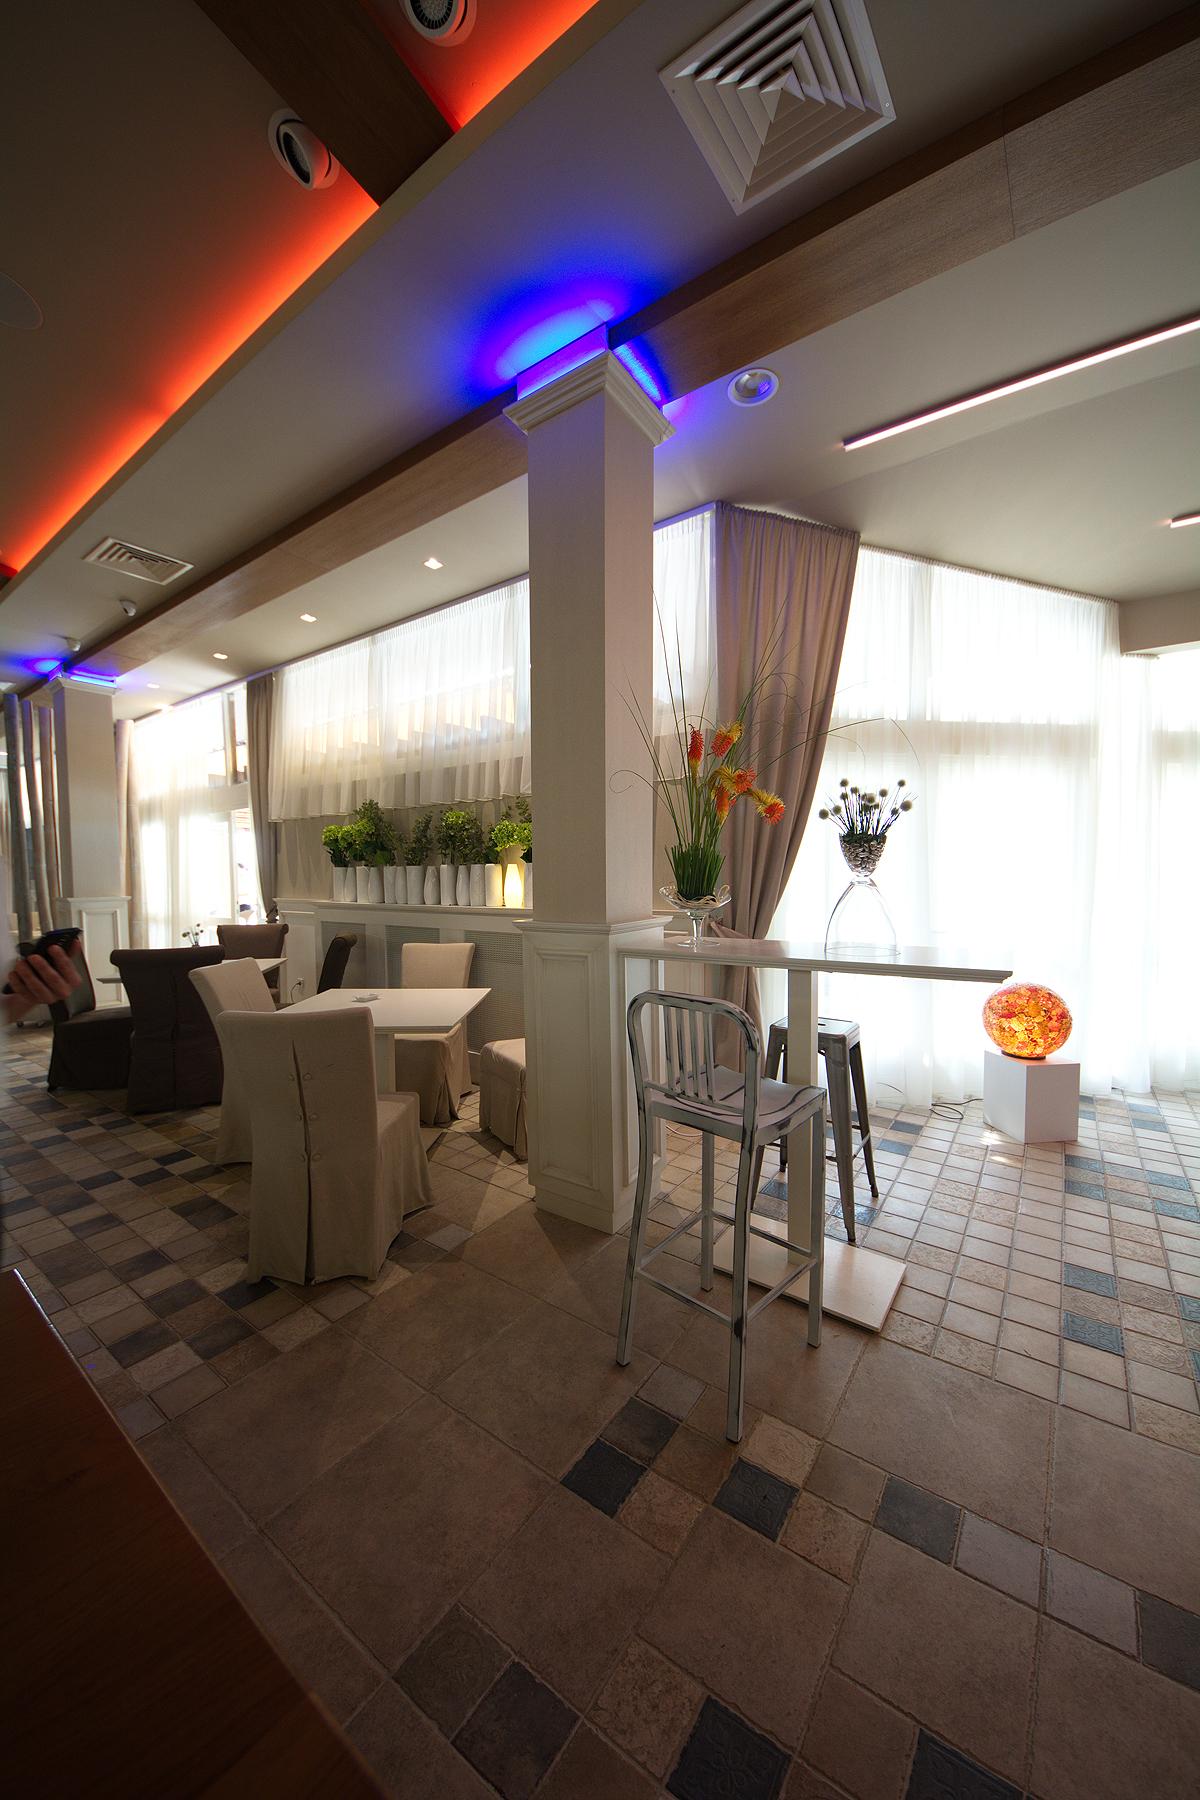 Restoran-Bagdala-Krusevac-001